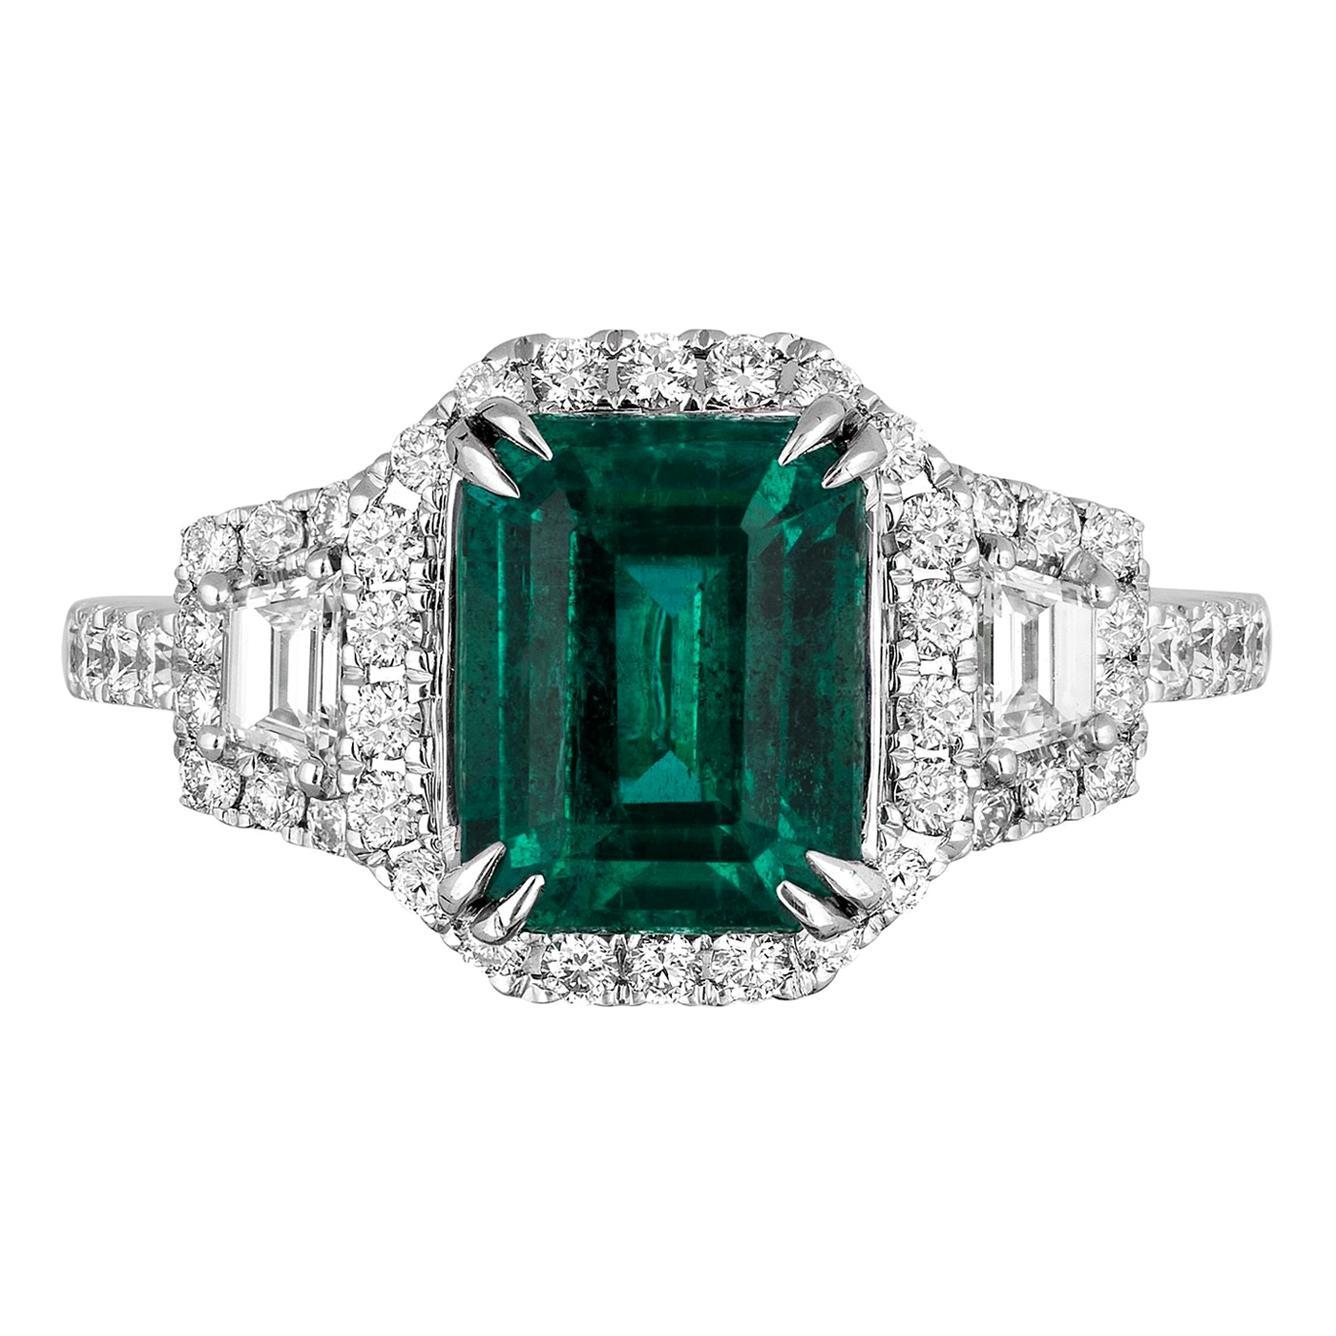 2.16 Carat Zambian Emerald Diamond Cocktail Ring